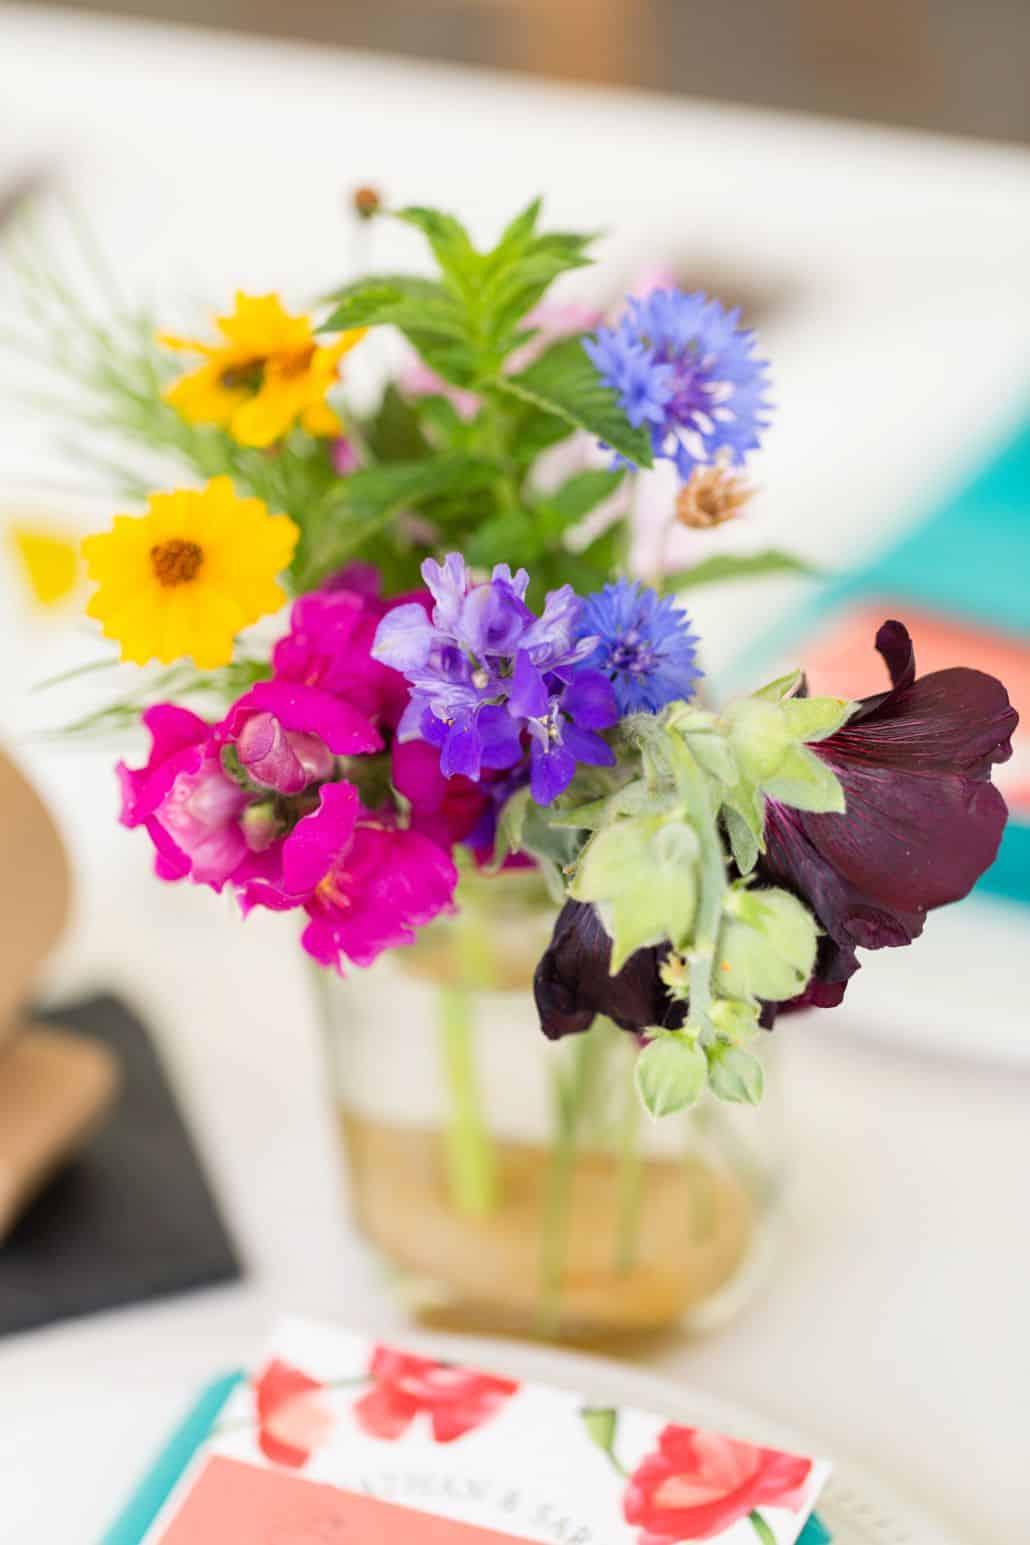 Jewel Tone Wildflowers With Mint In Mason Jar Wedding Table